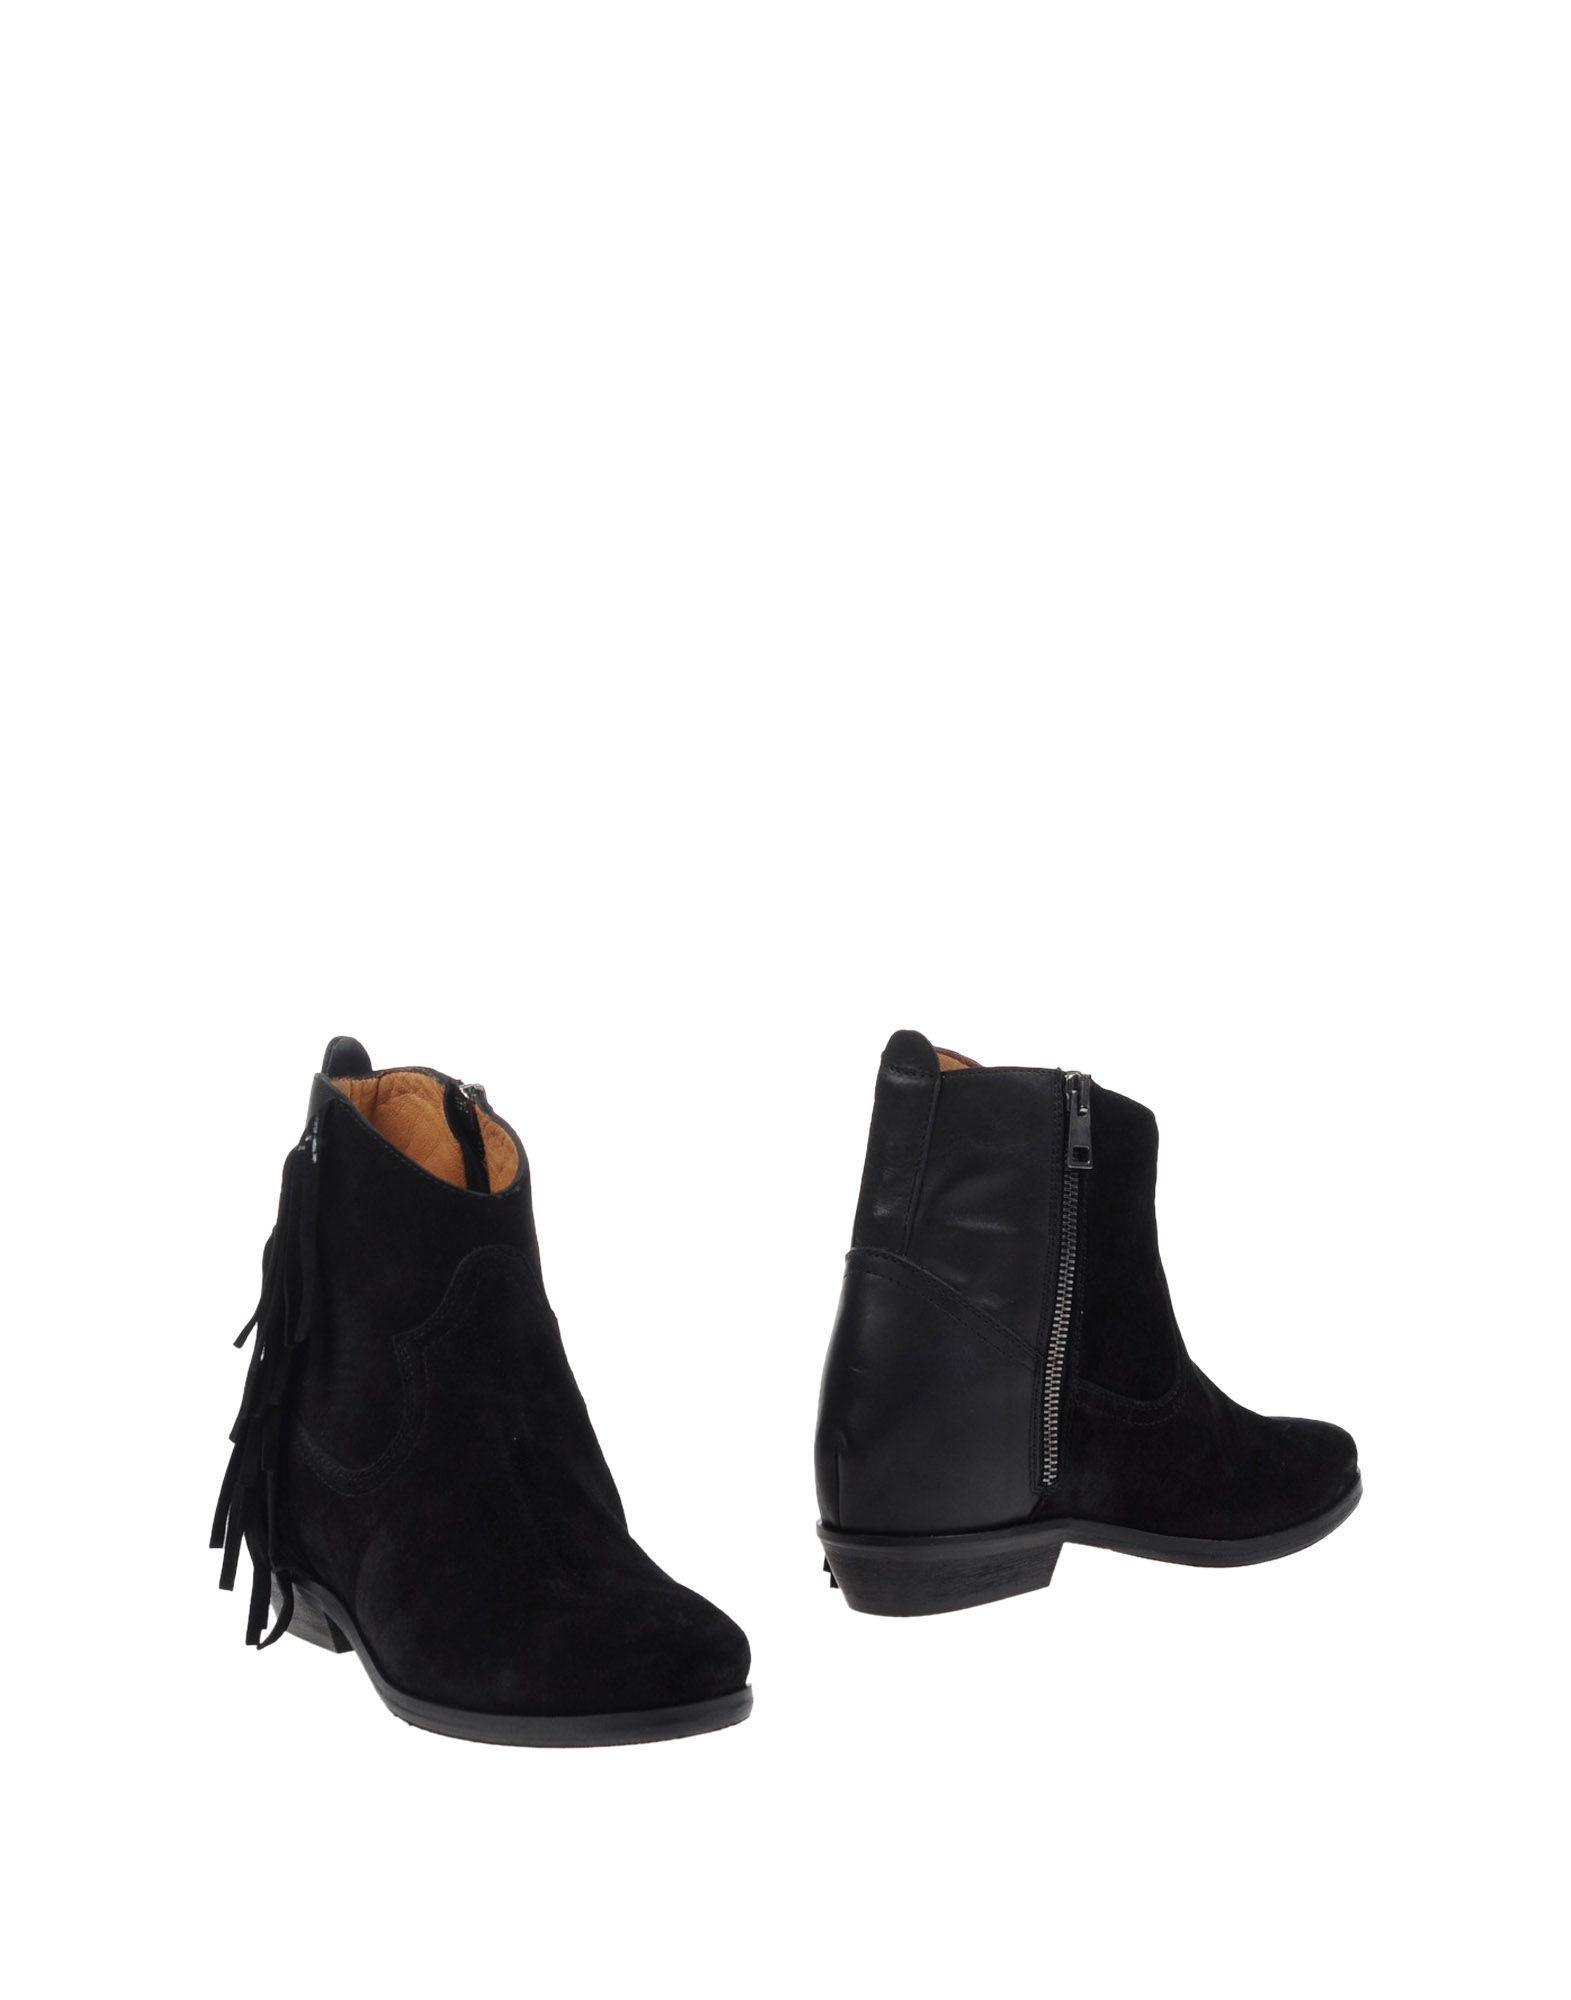 Liviana Conti Ankle Boot - Women Liviana Conti  Ankle Boots online on  Conti United Kingdom - 11080682XE f511f9